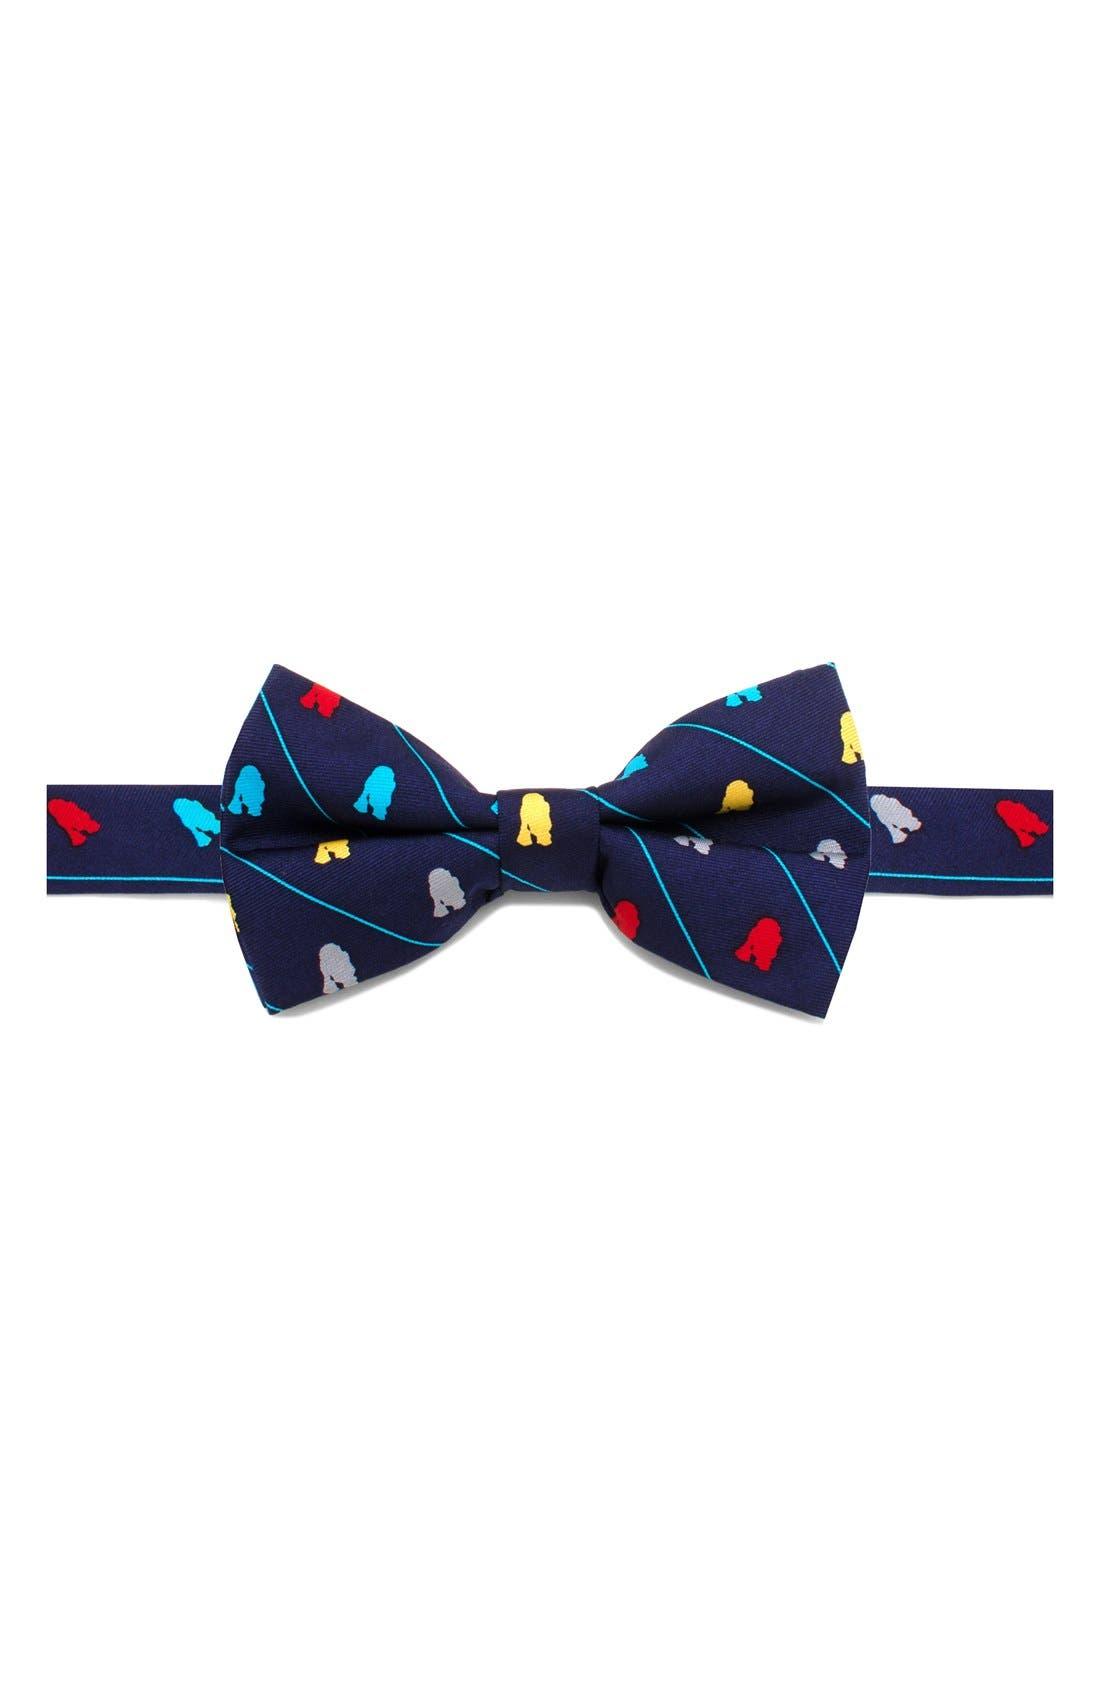 'Star Wars<sup>™</sup>- R2-D2 Stripe' Silk Bow Tie,                             Main thumbnail 1, color,                             Blue